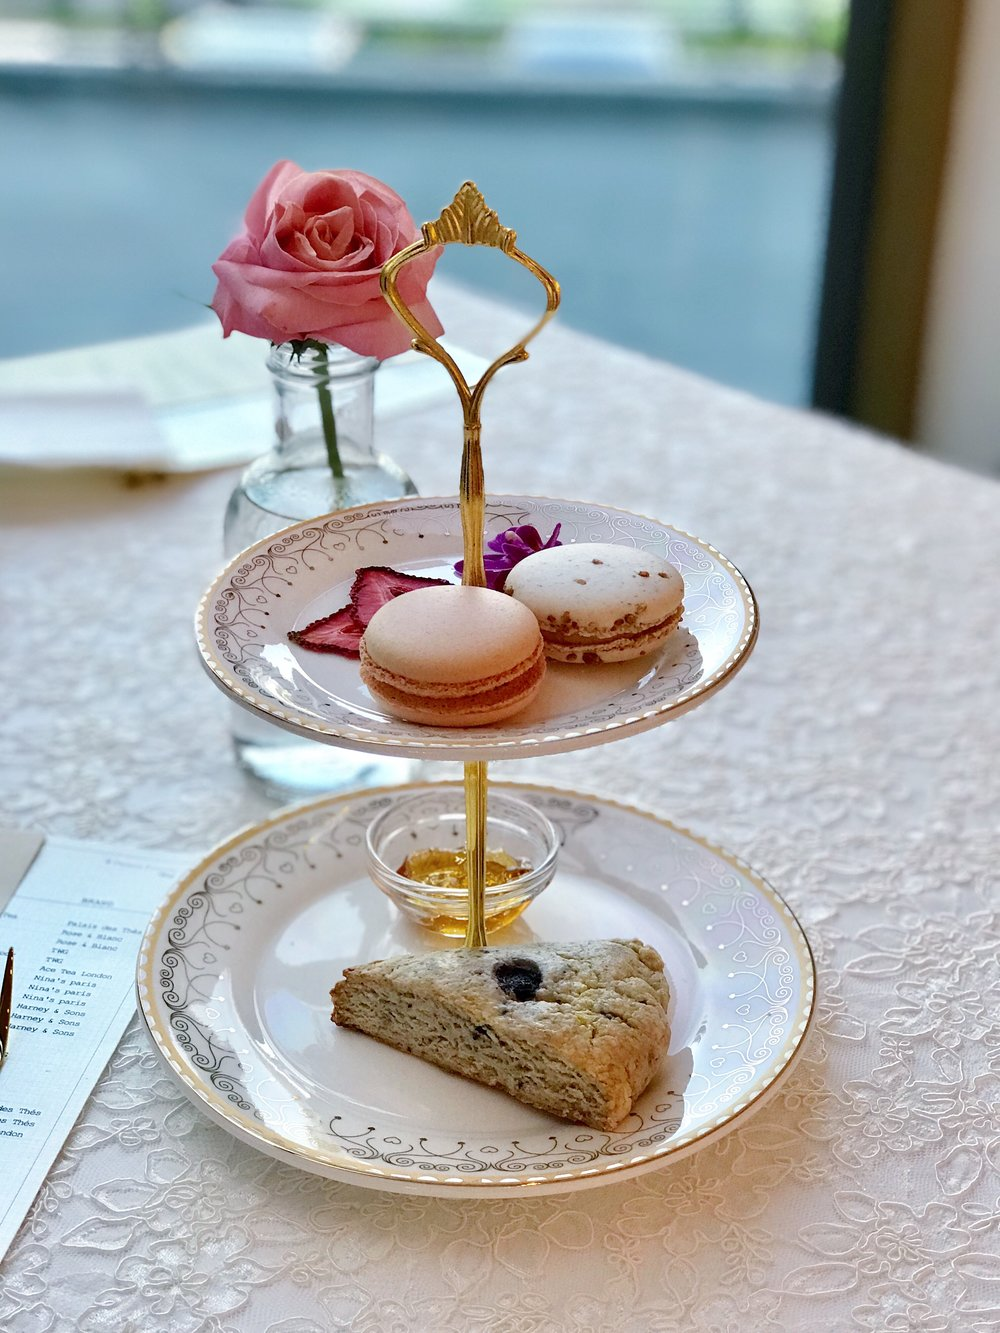 Tea Time - Rose & Blanc - Desserts - sabineforever.com.JPG